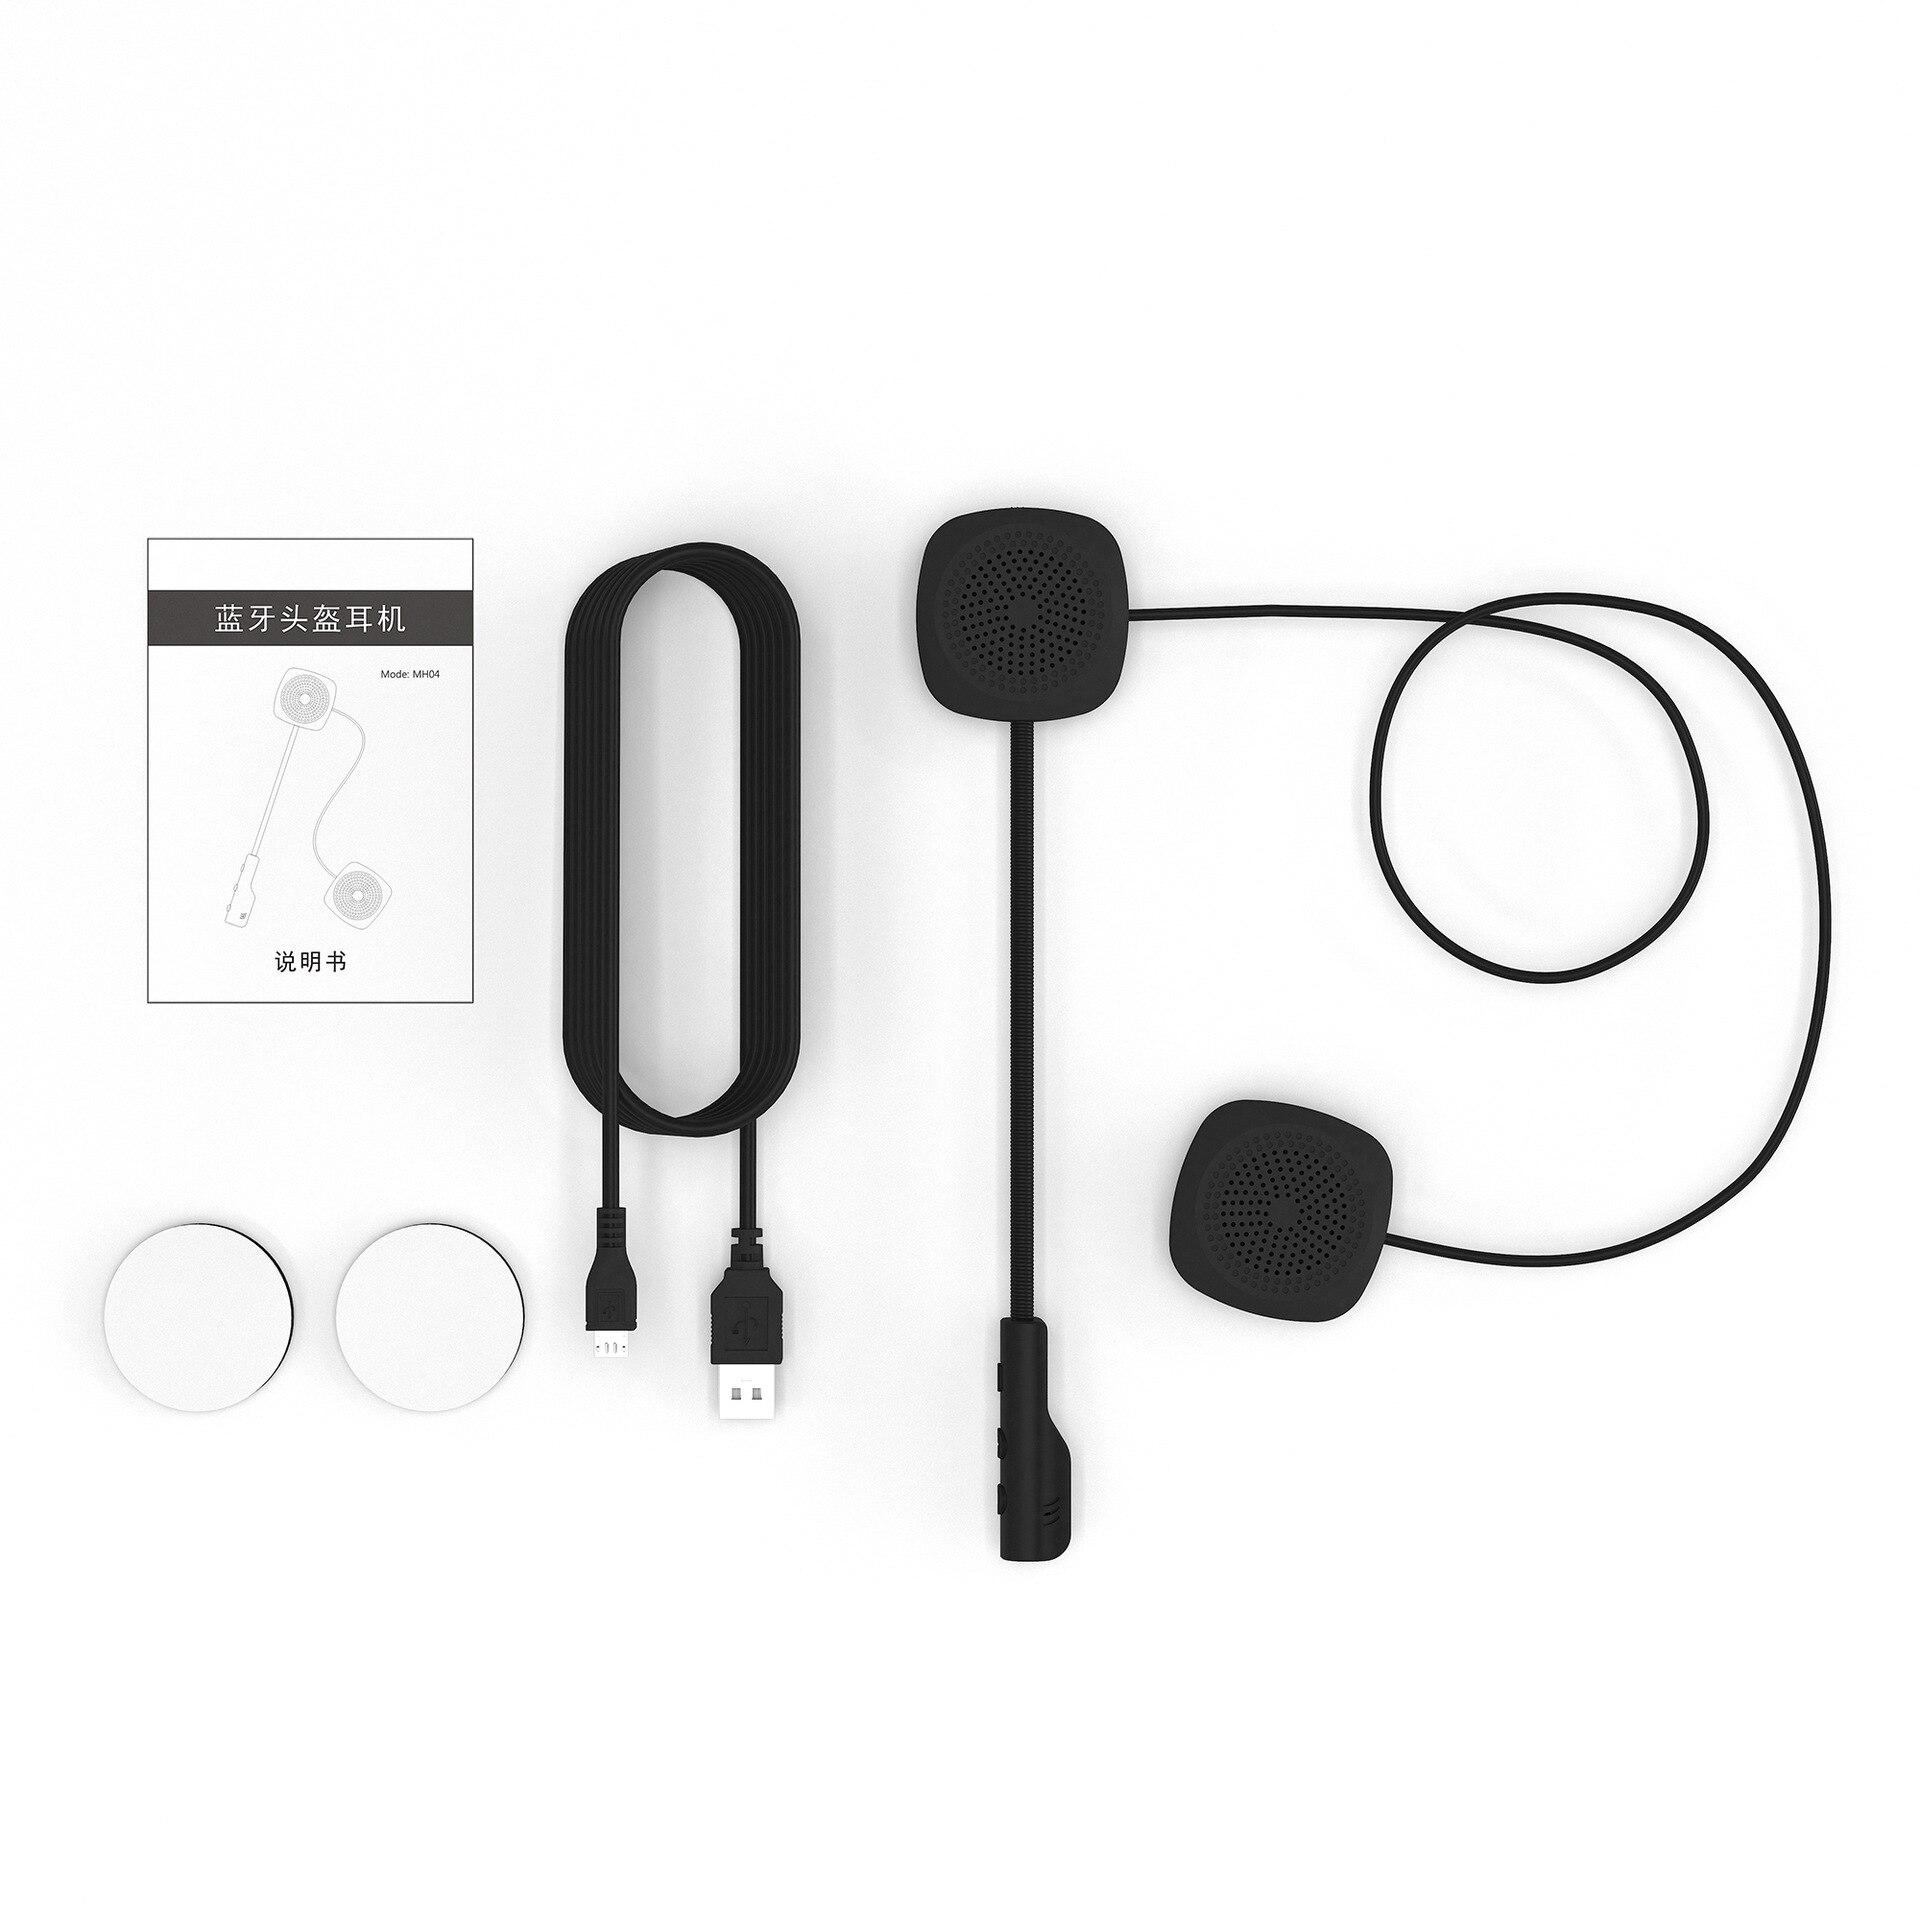 Motorcycle Bluetooth Helmet Headset 5.0 wireless headphones  bluetooth earbuds